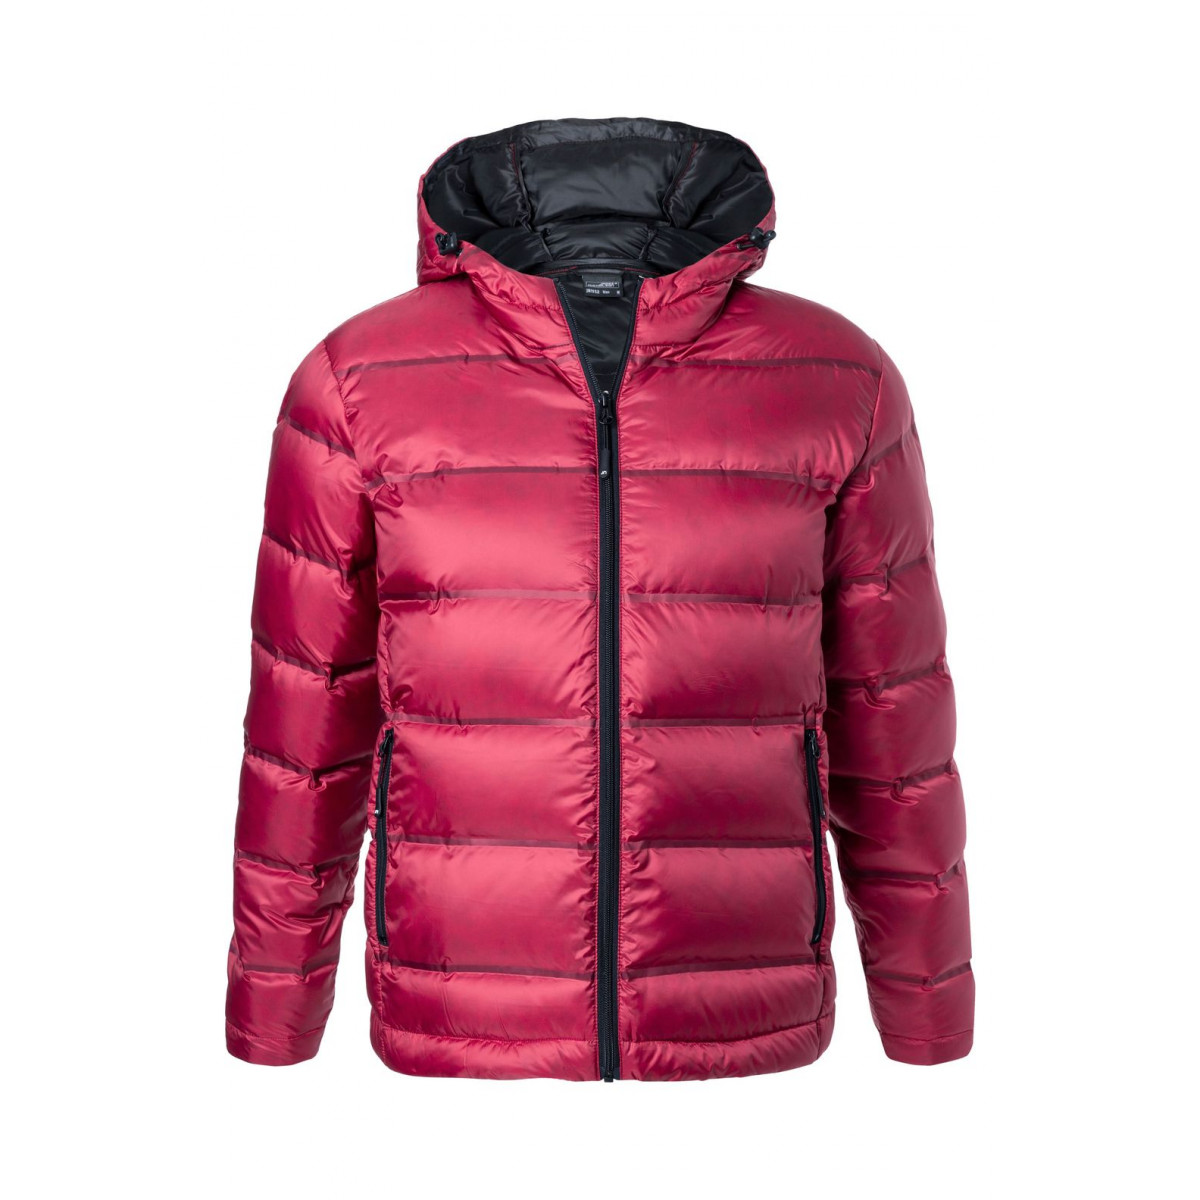 Куртка мужская JN1152 Mens Hooded Down Jacket - Красный/Черный